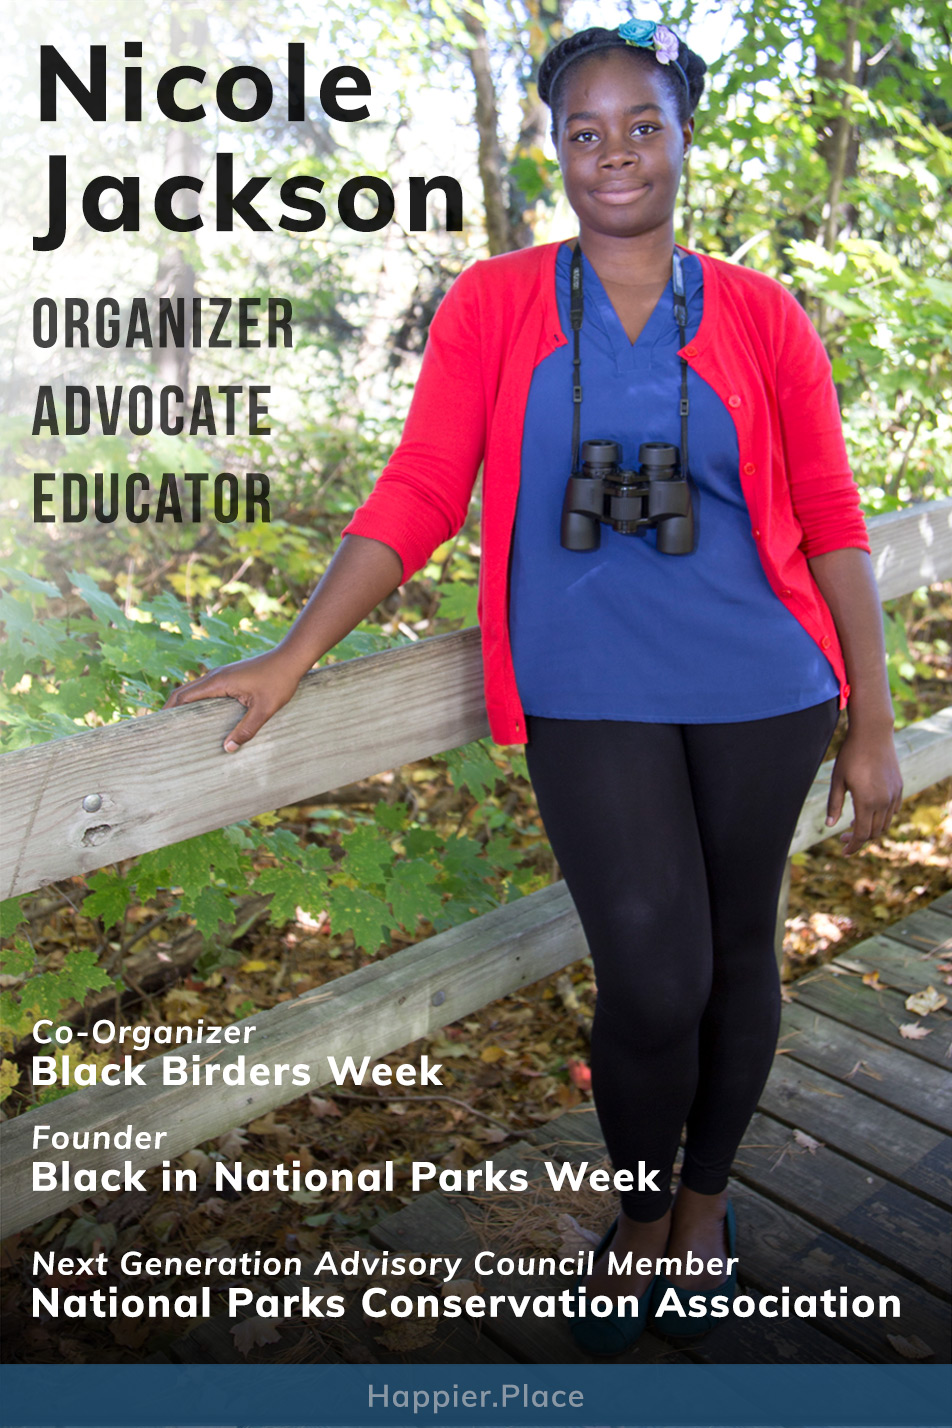 Nicole Jackson: Environmental Educator, Advocate, and Organizer (Columbus, Ohio)